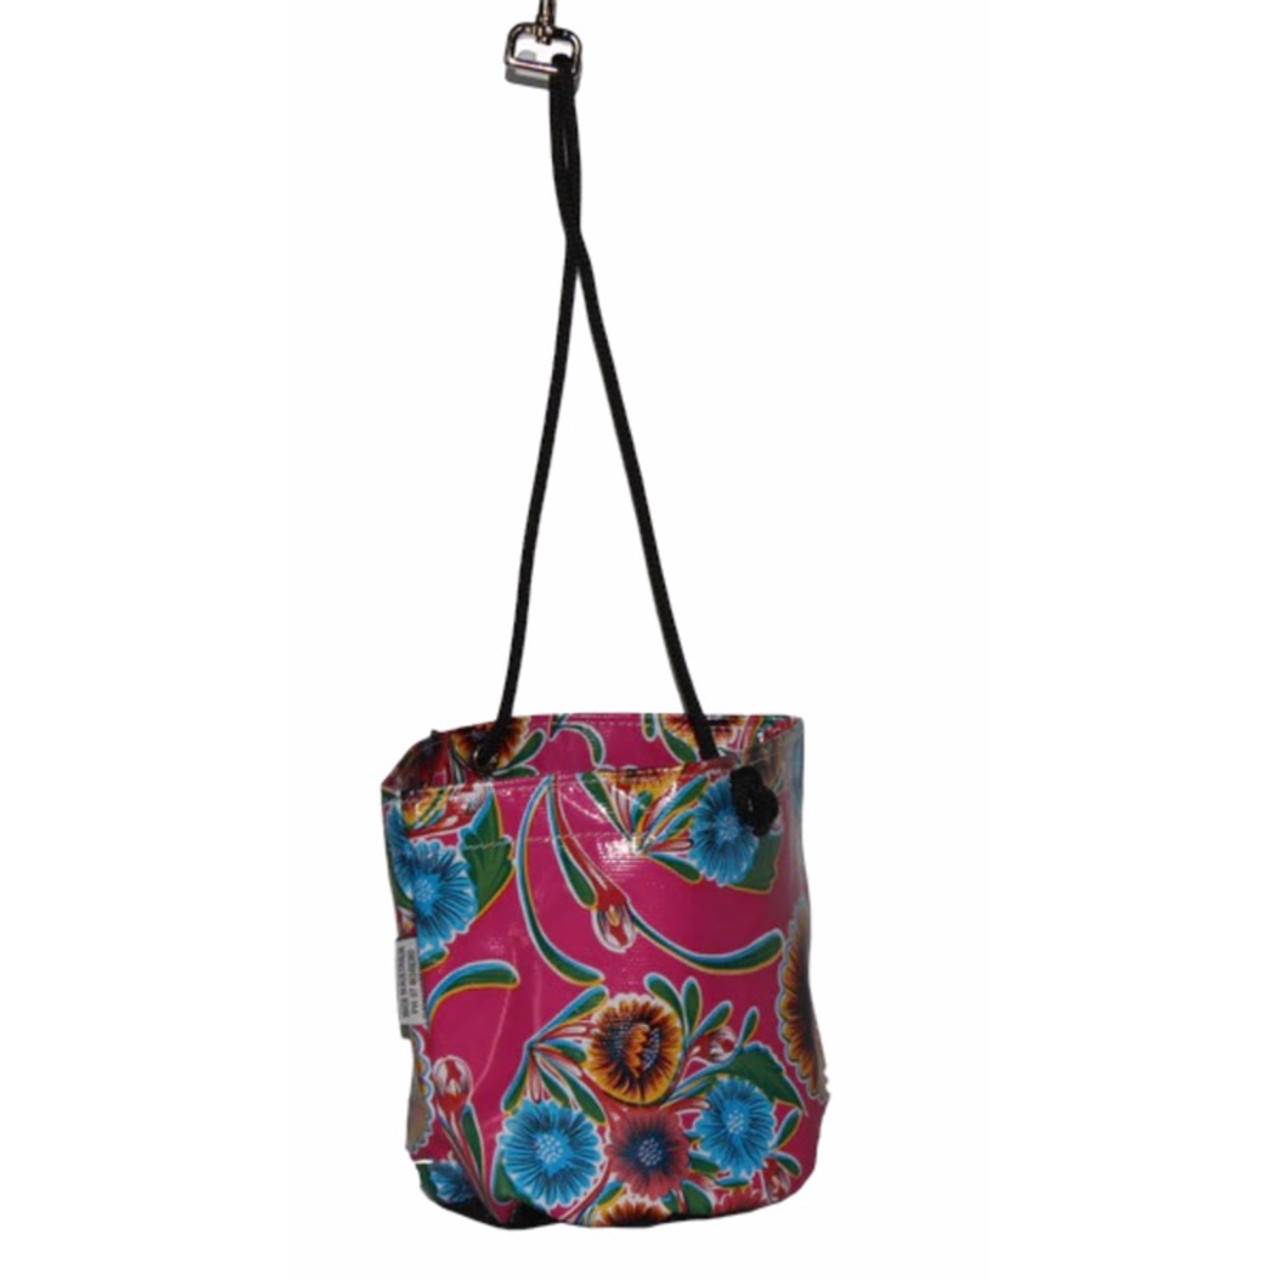 Peg Bag Oil Cloth  25cm L X 25cm W